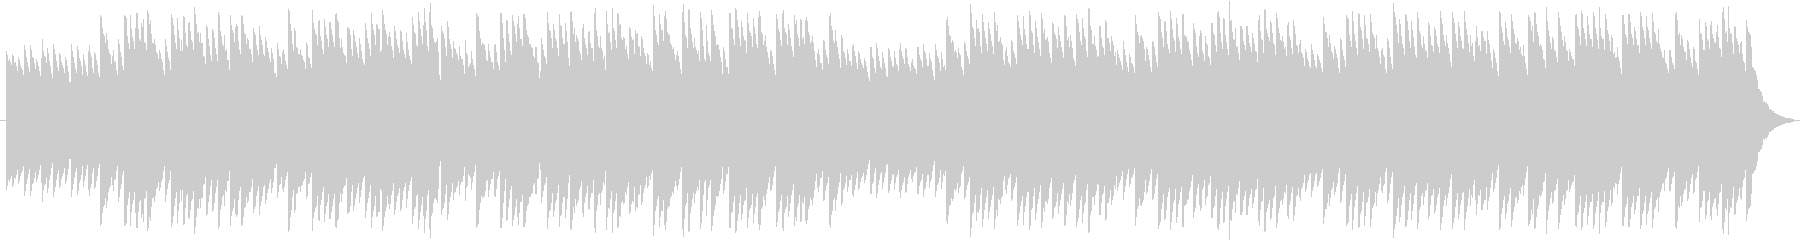 8bit風メルヘンBGMの未再生の波形